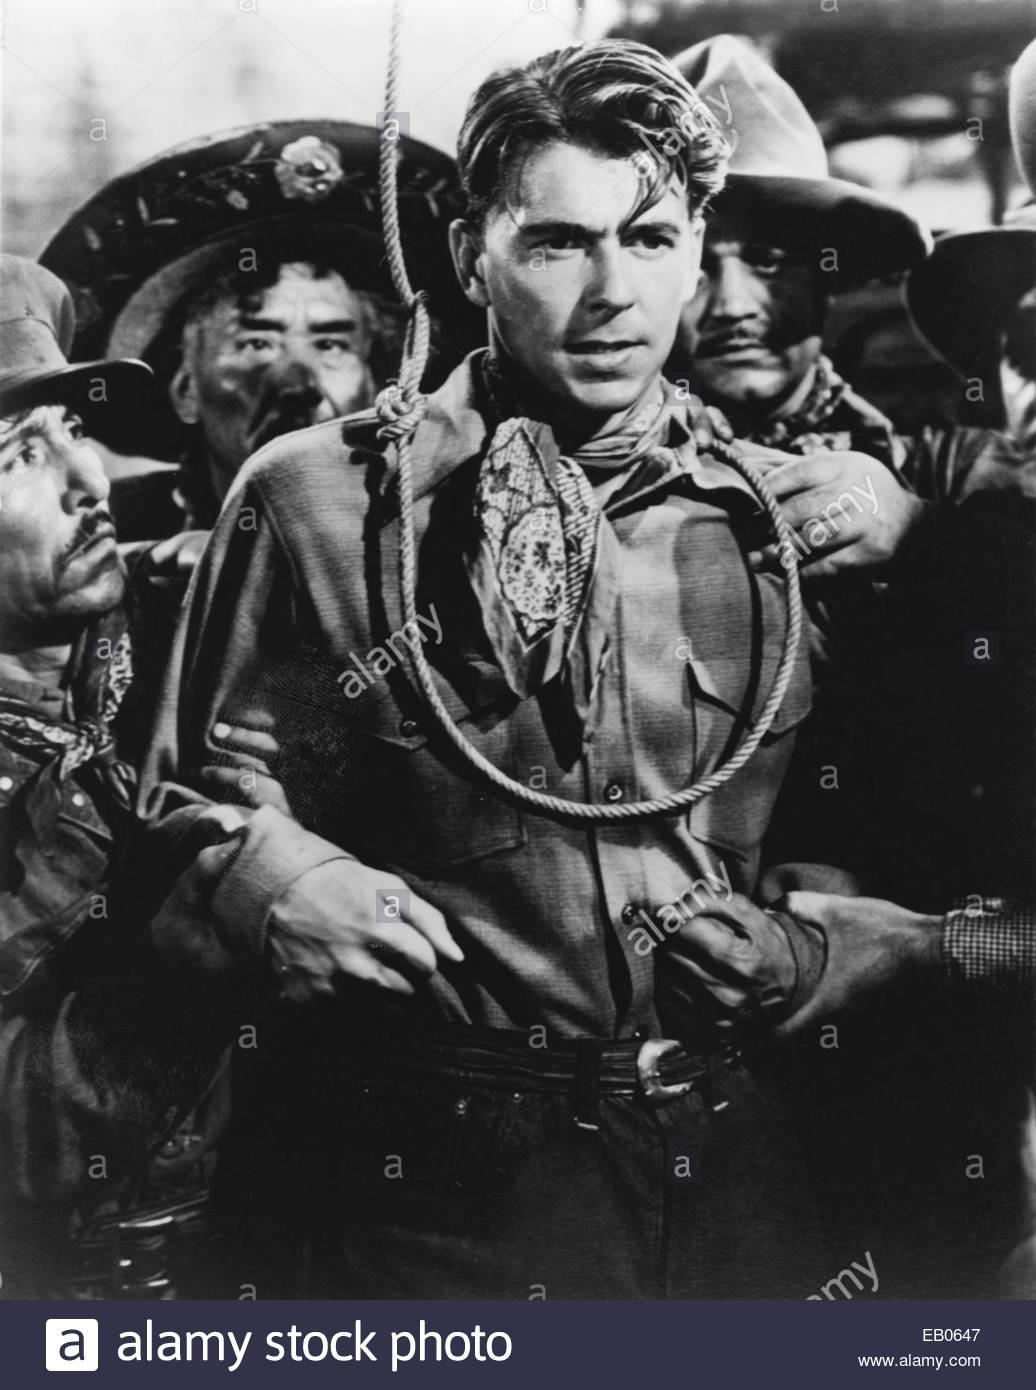 RONALD REAGAN circa 1940s. - Stock Image